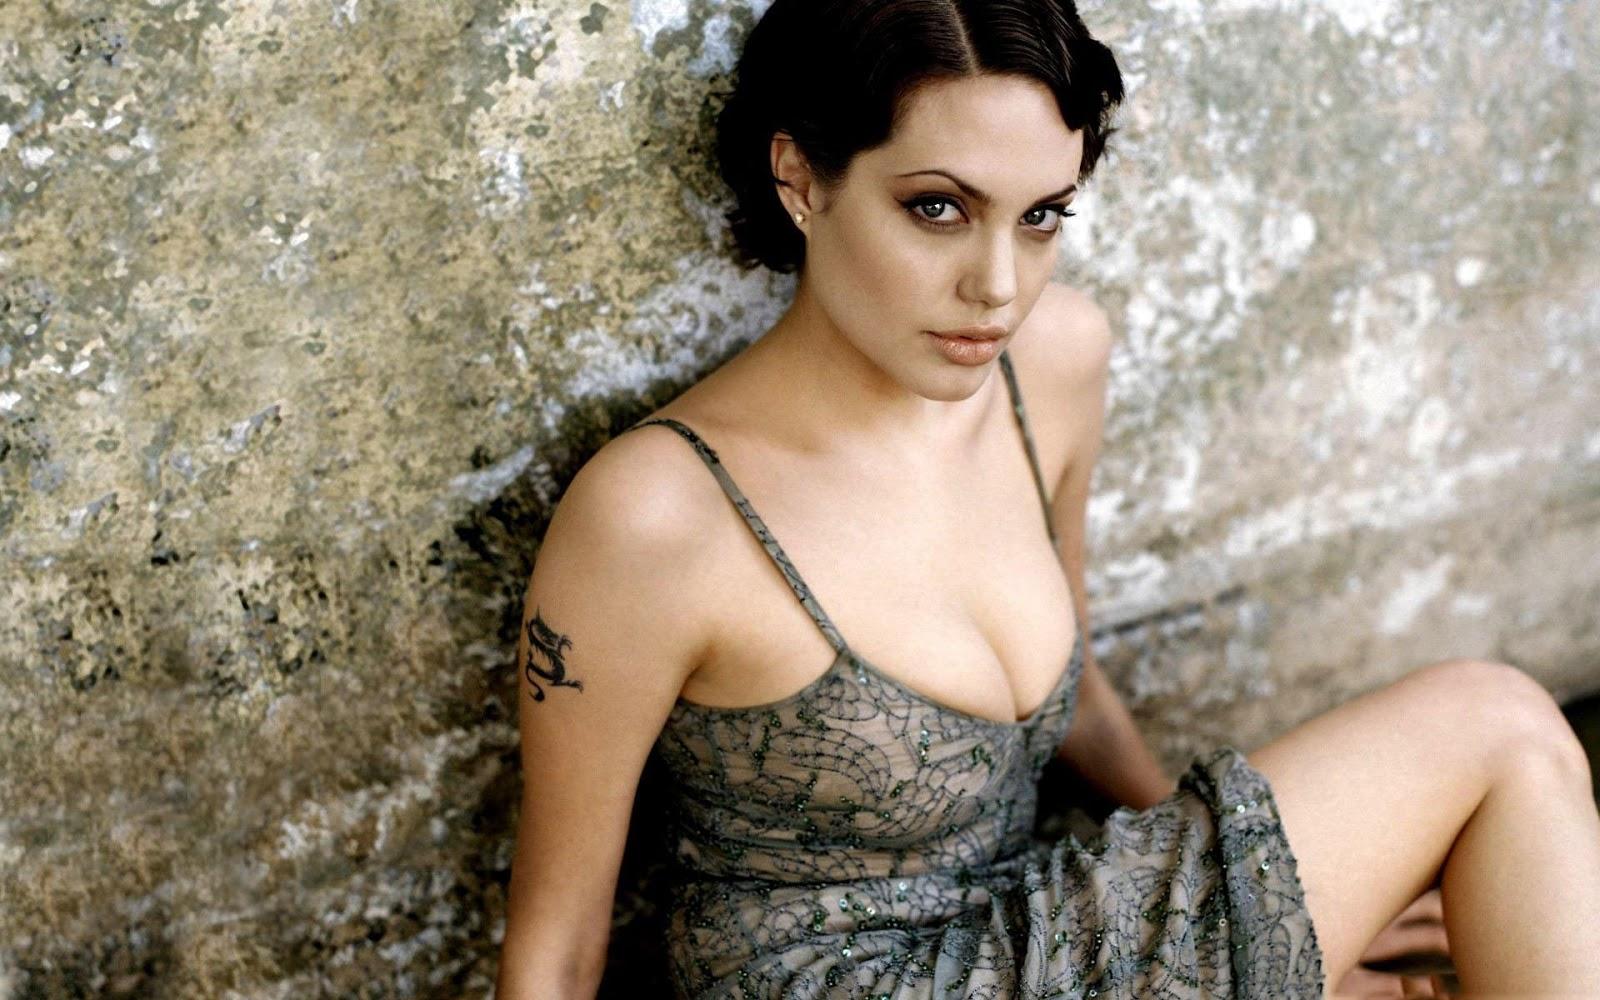 http://1.bp.blogspot.com/--hs-mheqBms/URxywN3l7oI/AAAAAAAAETs/XBq_eHk8KZ8/s1600/Angelina+Jolie+fresh+photo++2013+05.jpg